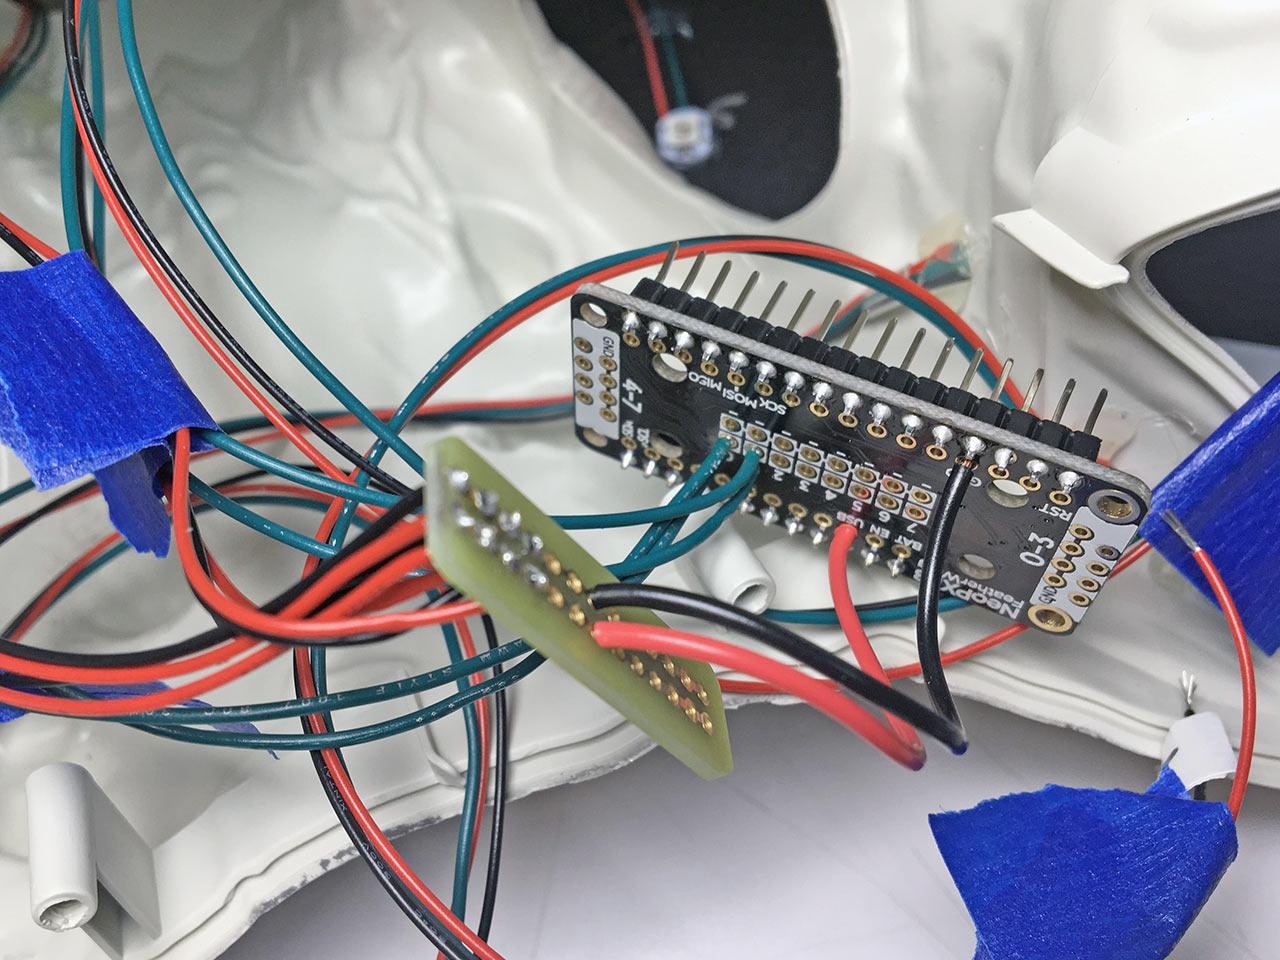 led_pixels_connections1.jpg